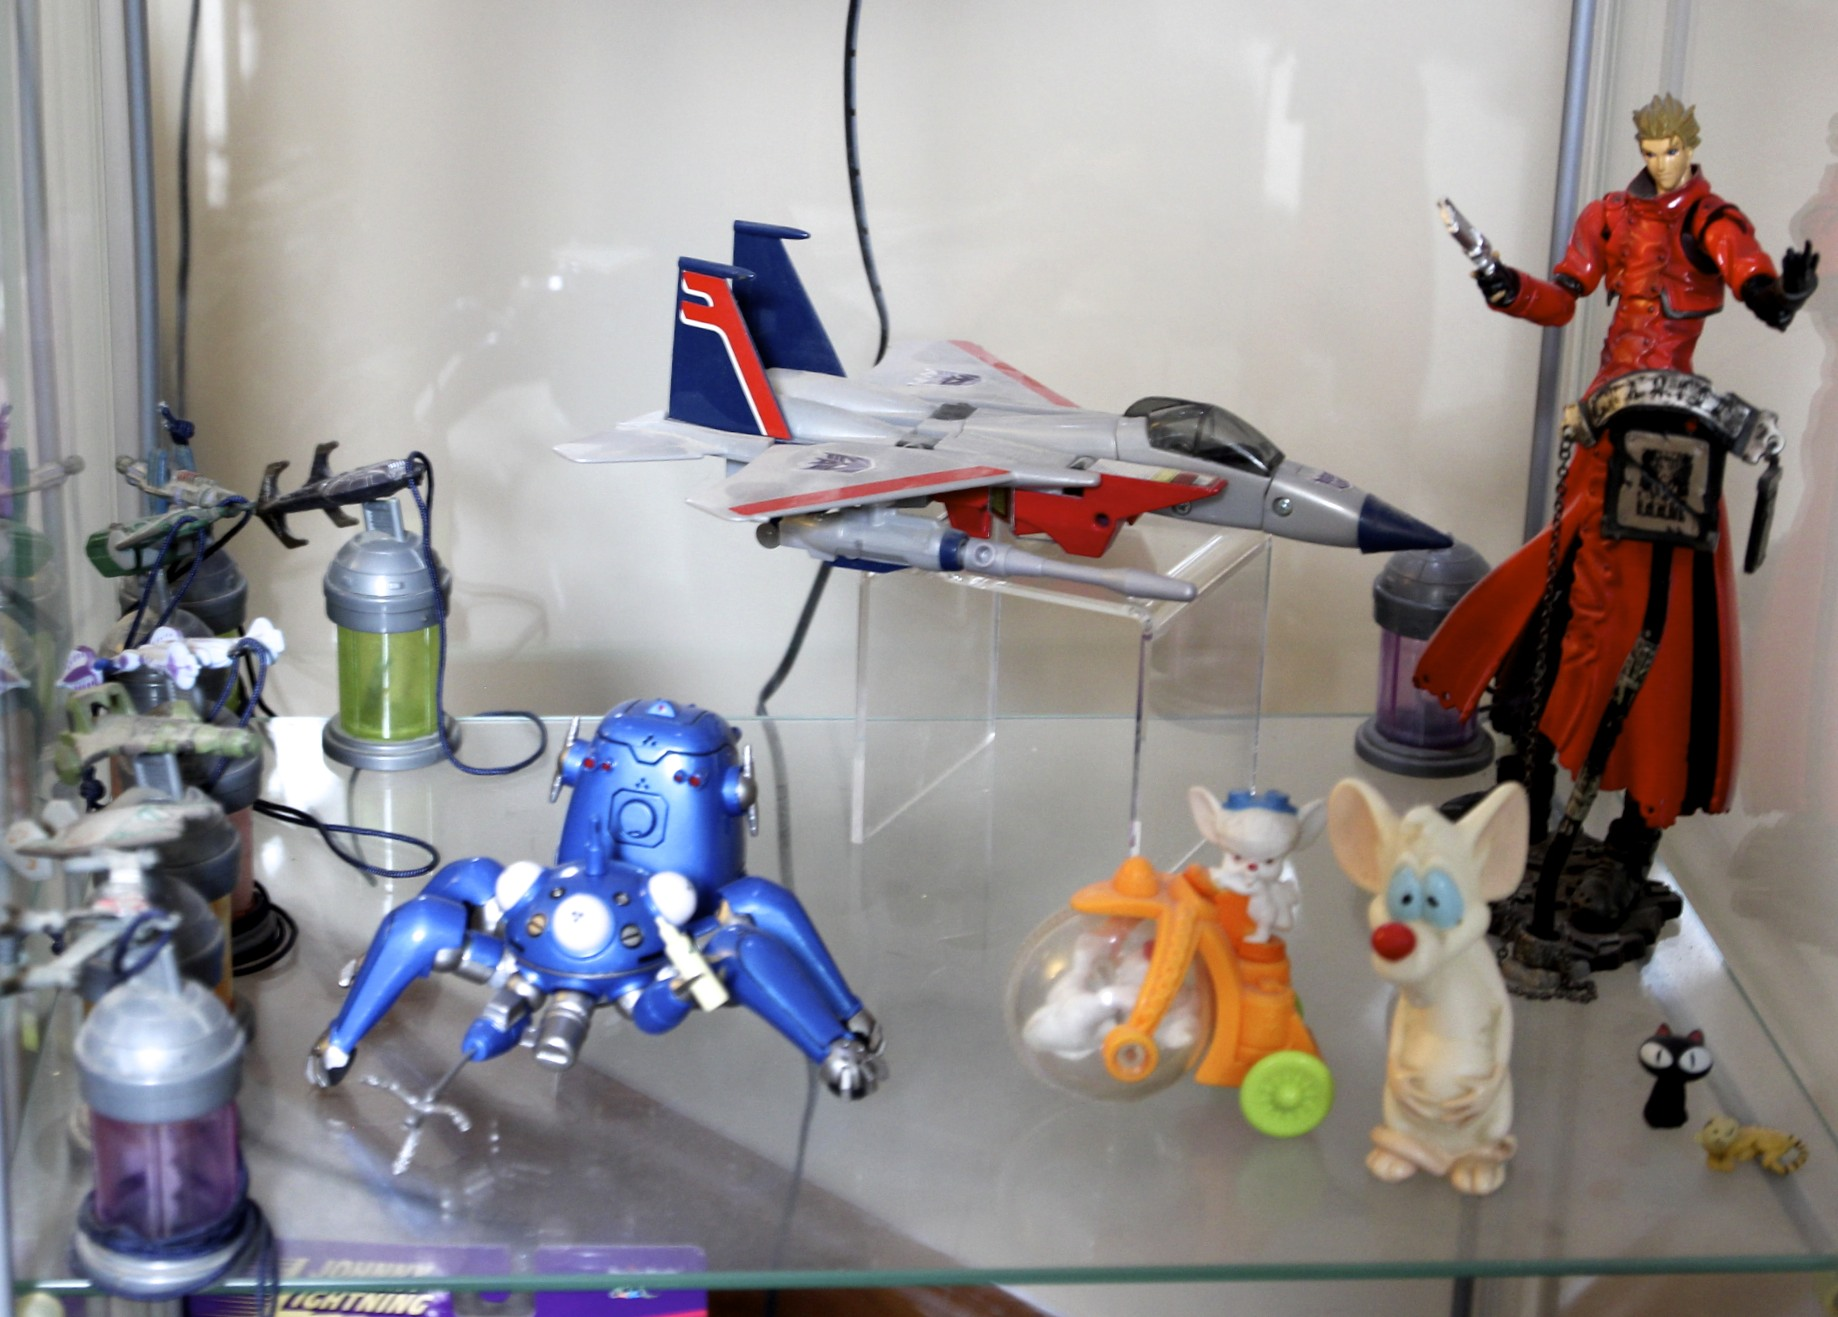 Babylon 5  Starships, Starscream,  Trigun's  Vash the Stampede,  Ghost in the Shell  Tachikoma,  Animaniacs Pinky and the Brain.